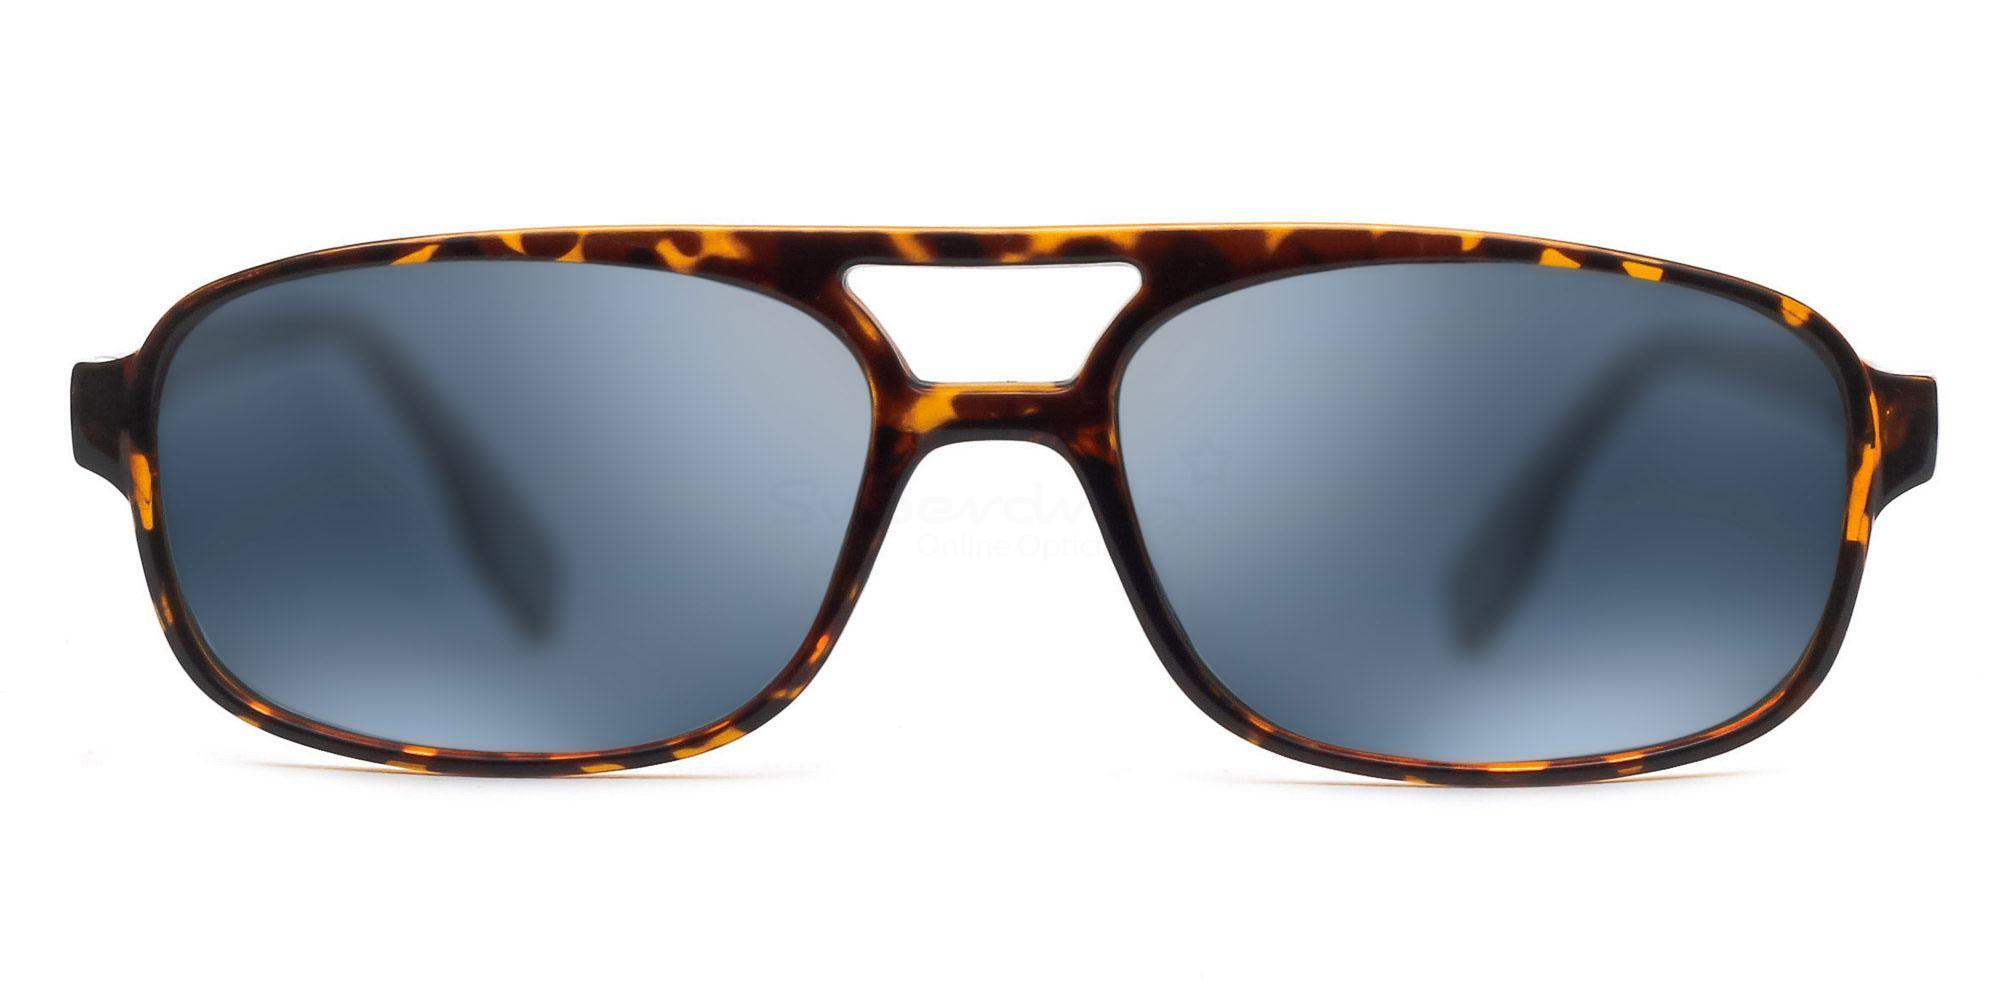 C04 Polarized Grey with Silver Mirror P2395 - Demi Havana (Mirrored Polarized) Sunglasses, Neon